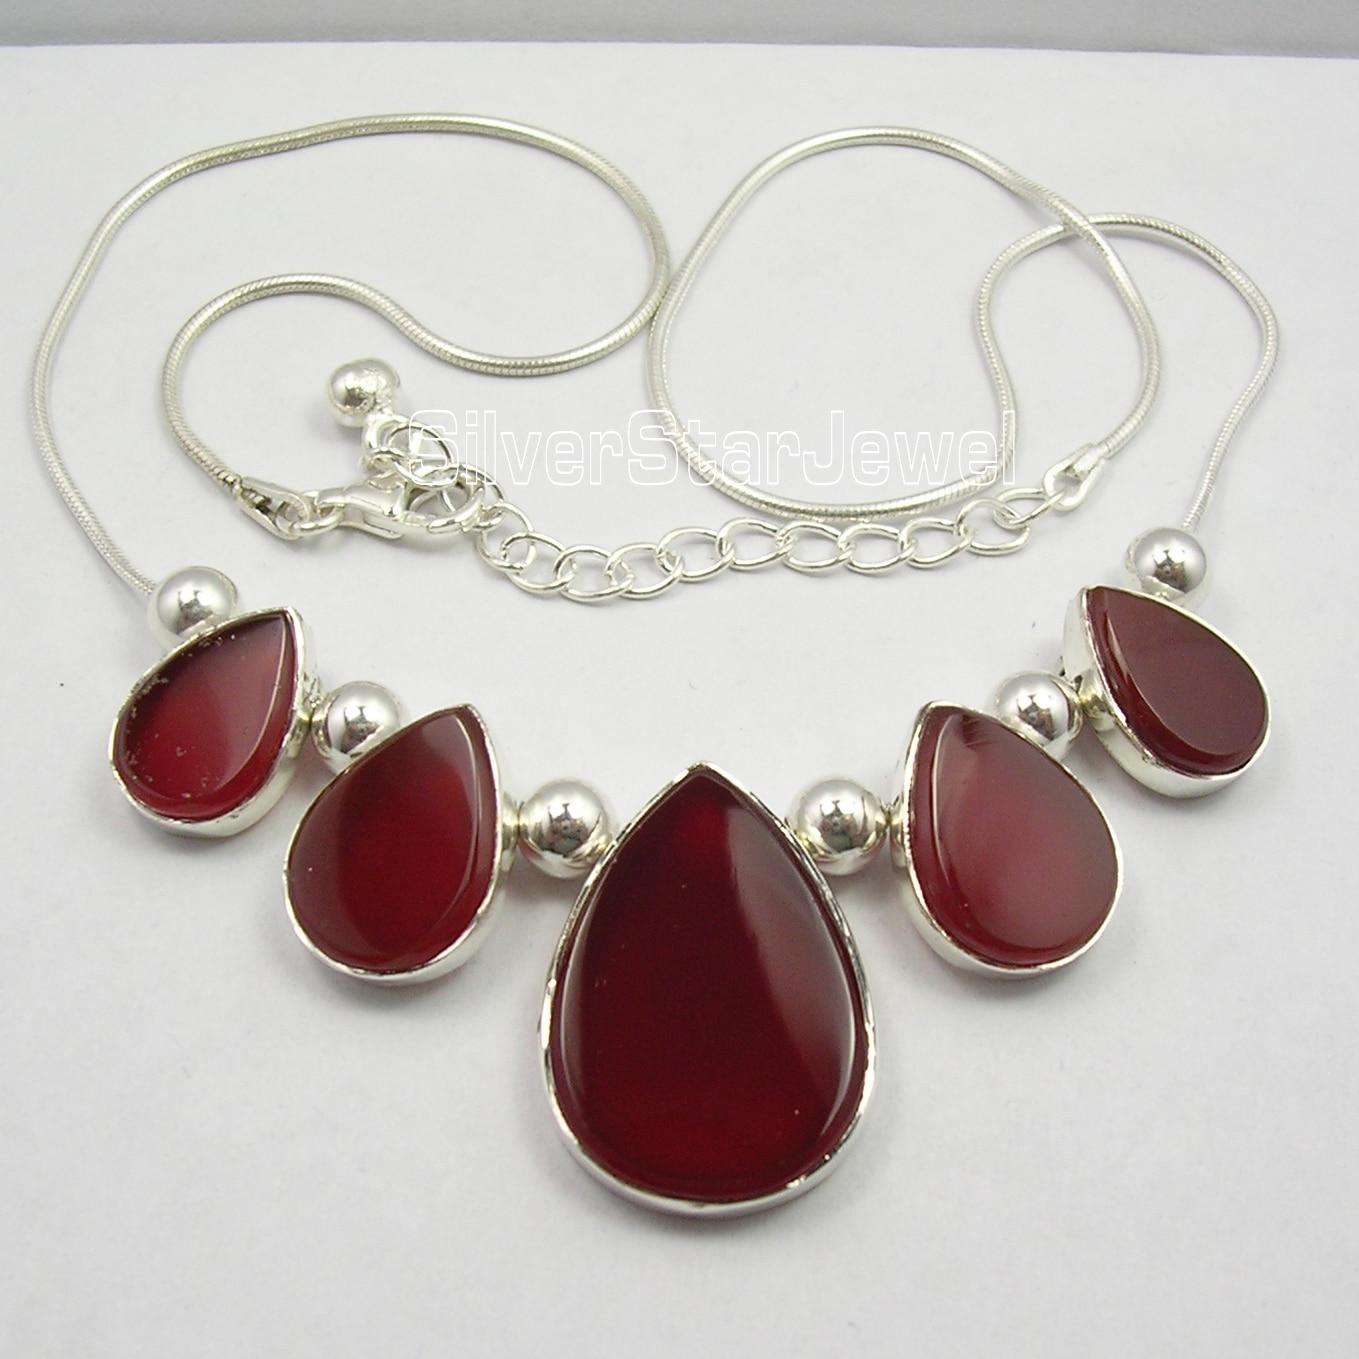 Chanti International . Silver RED FIRE CARNELIAN ART Necklace 18.5 Inches WOMEN'S JEWELRY серьги art silver art silver ar004dwzmh30